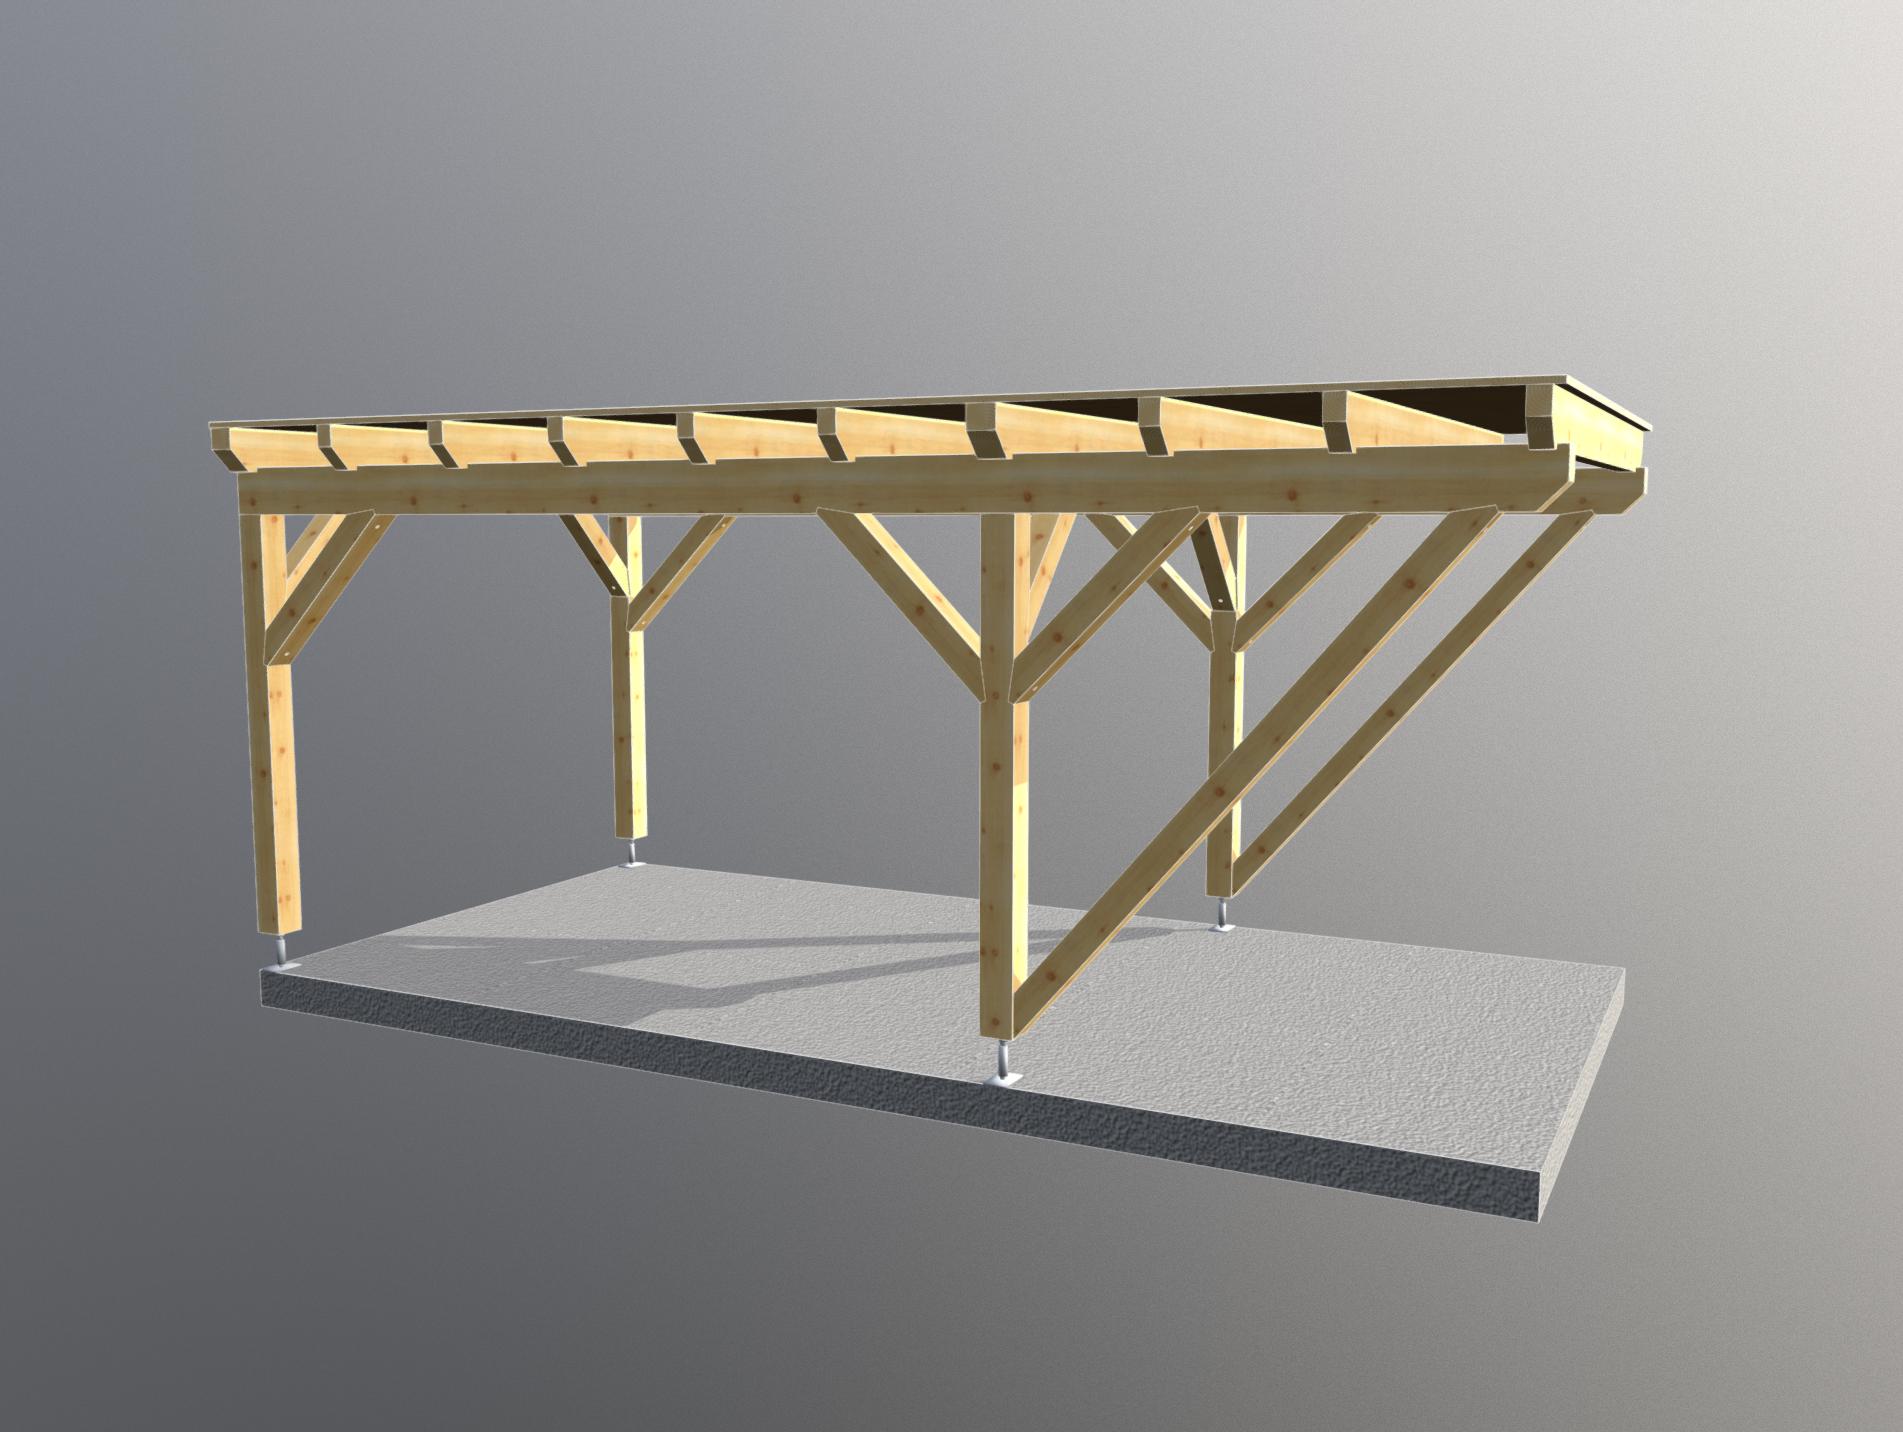 Holz Carport 3m x 6m flachdach, carports aus polen, gartenhaus aus ...